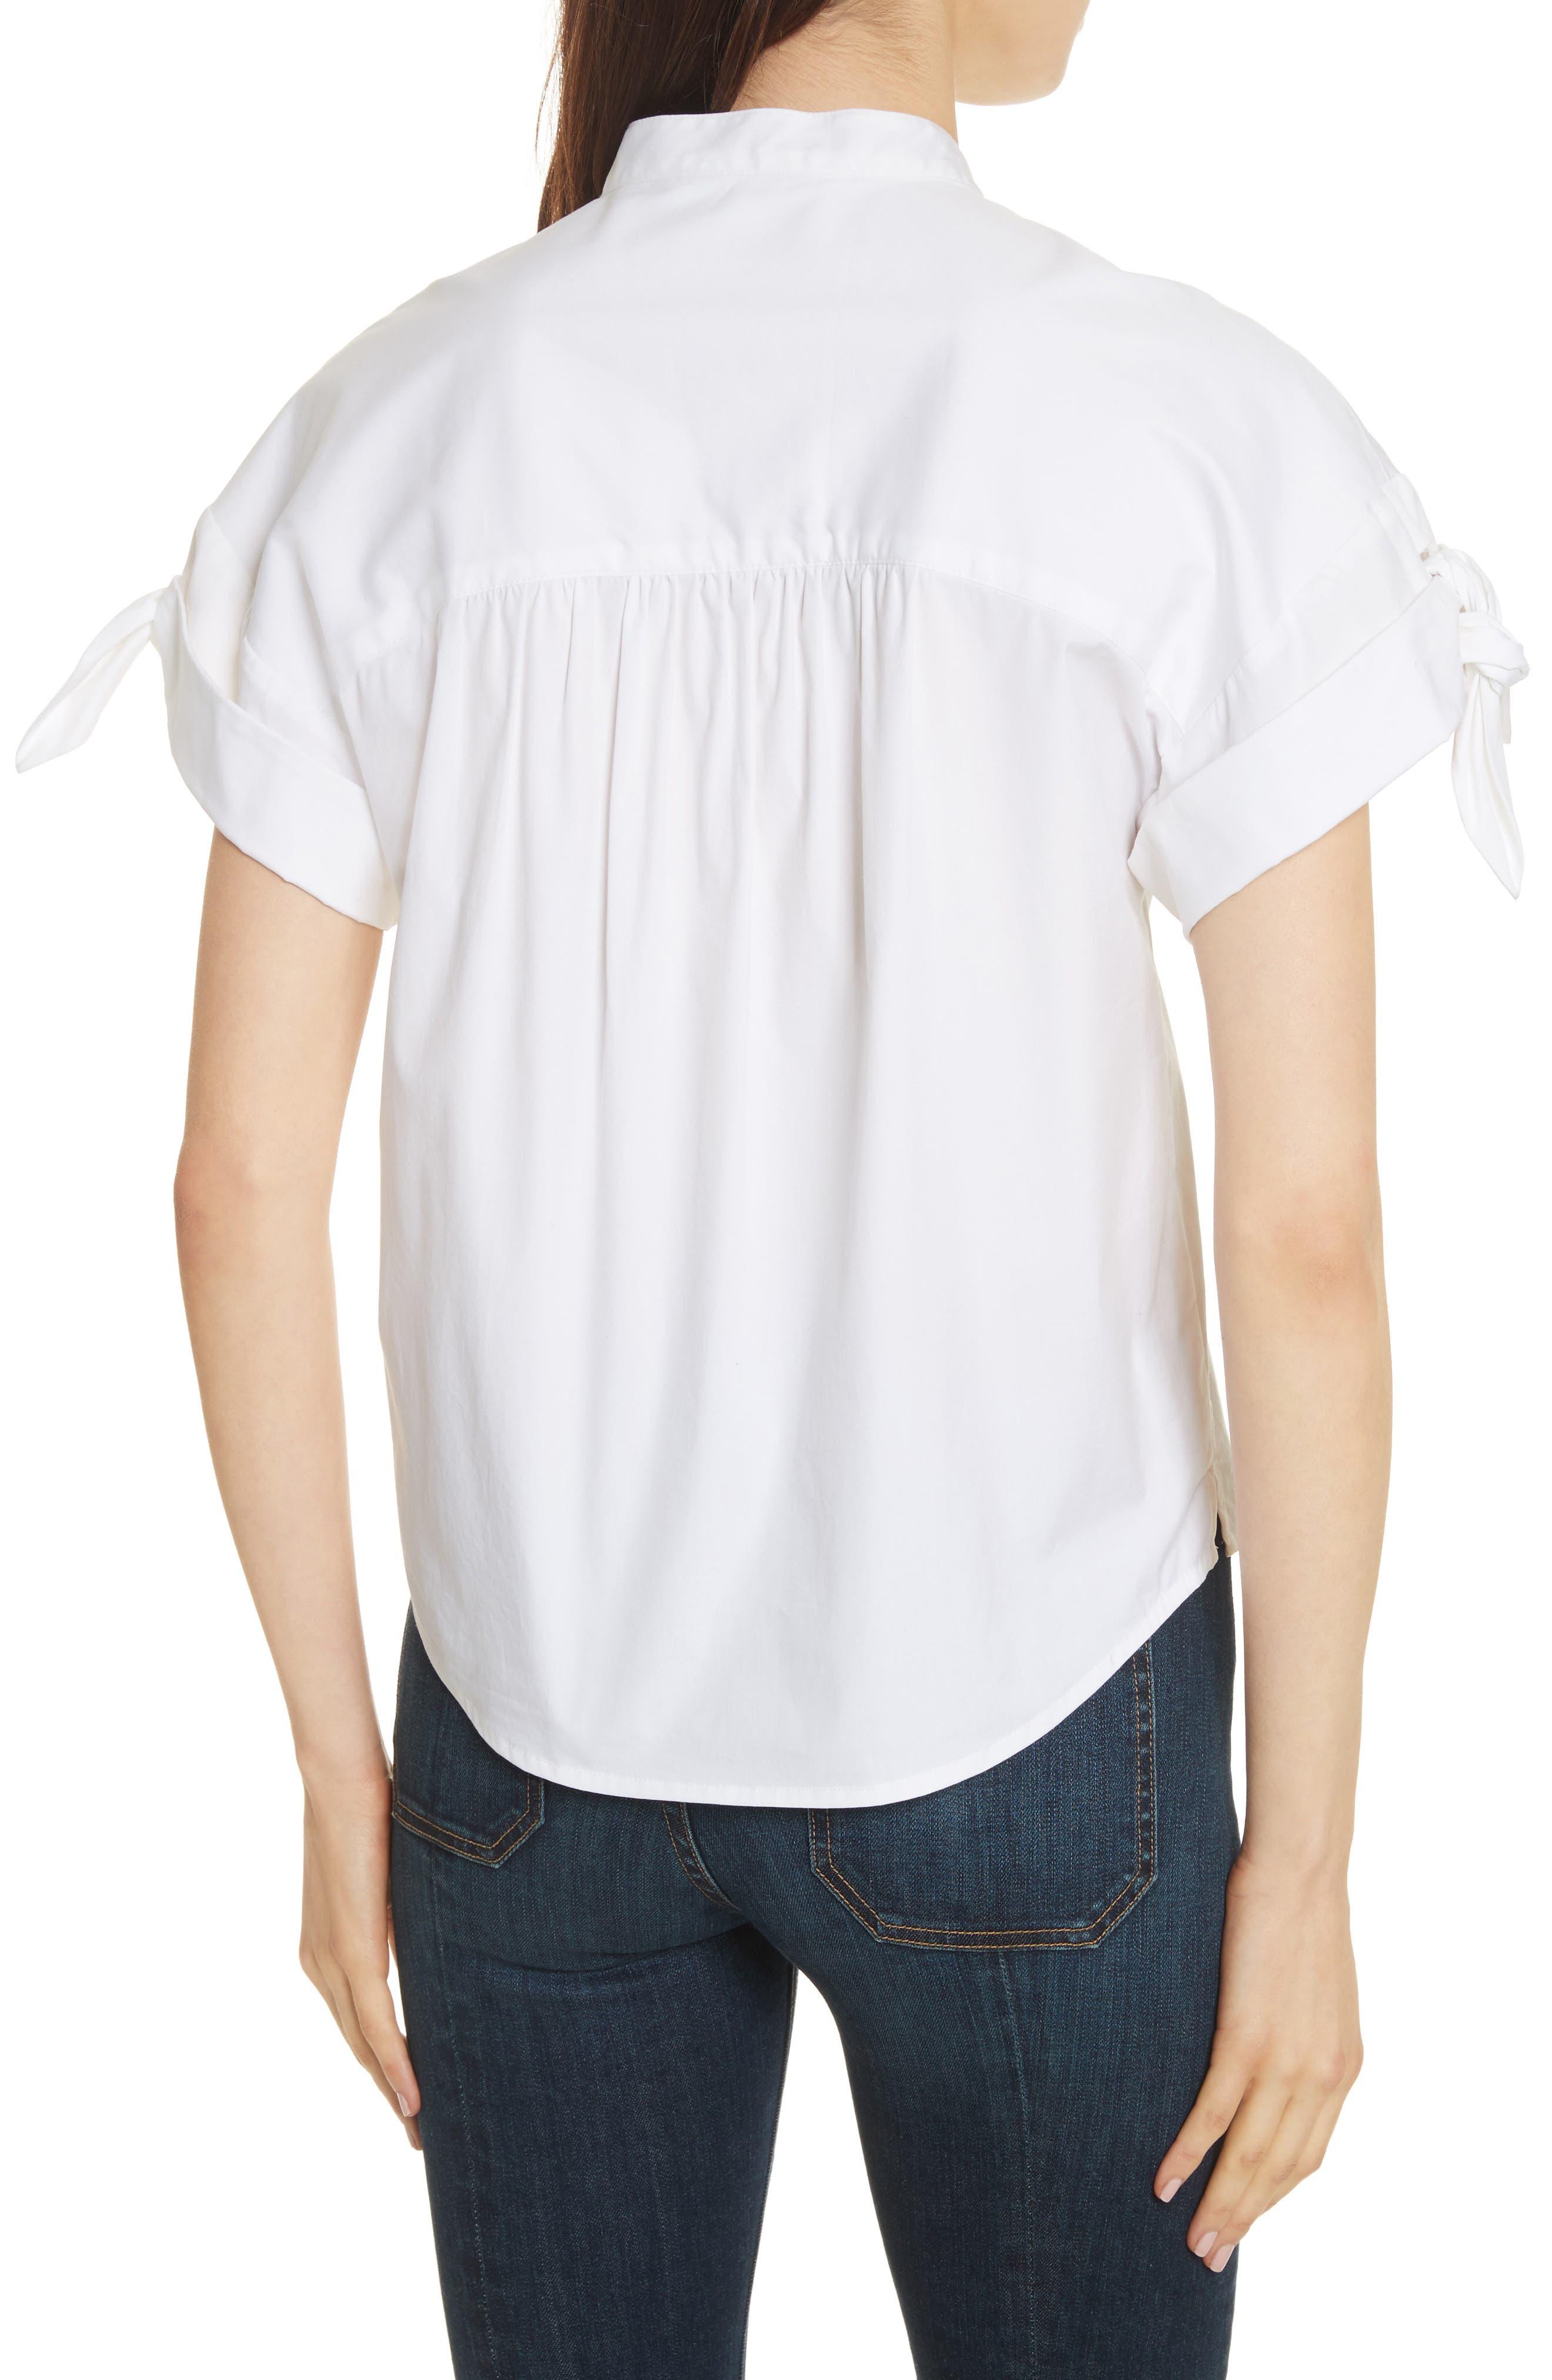 Sanaa Stretch Cotton Shirt,                             Alternate thumbnail 2, color,                             White